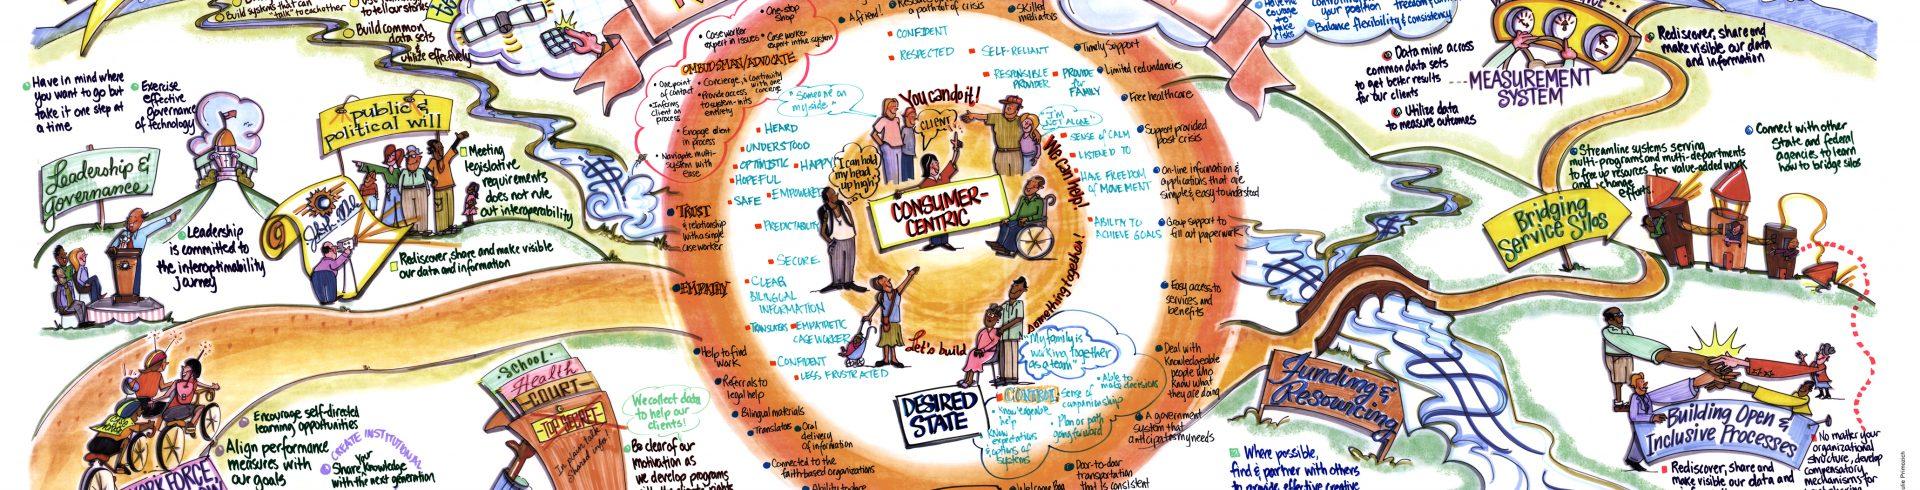 ACF Interoperability Initiative – Roadmap: Principles